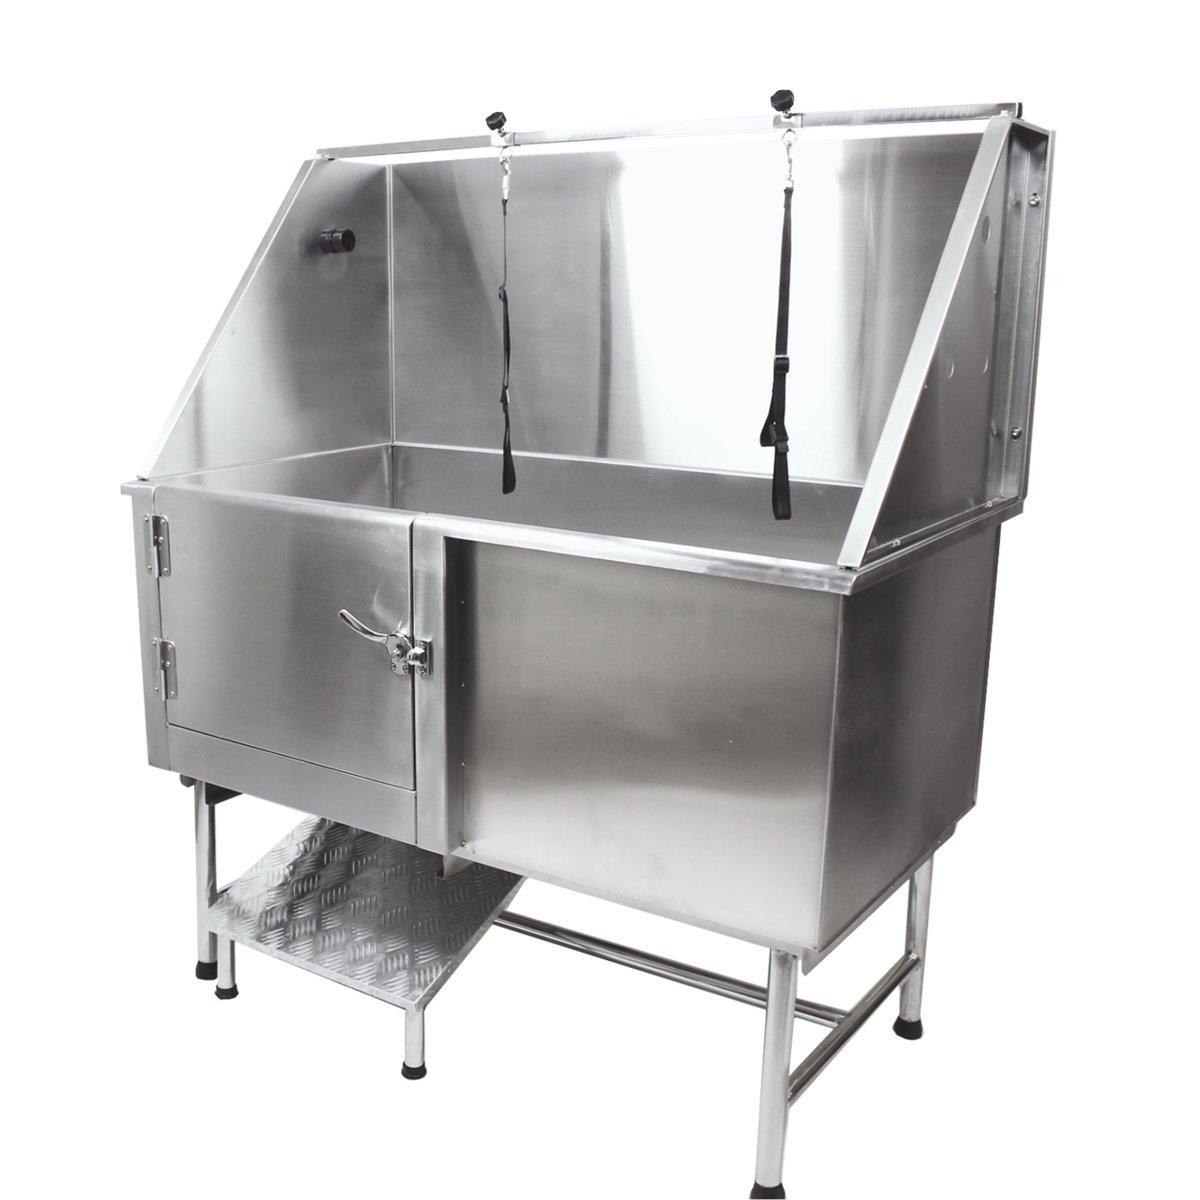 Amazon.com: Flying Pig Grooming bañera profesional de ...